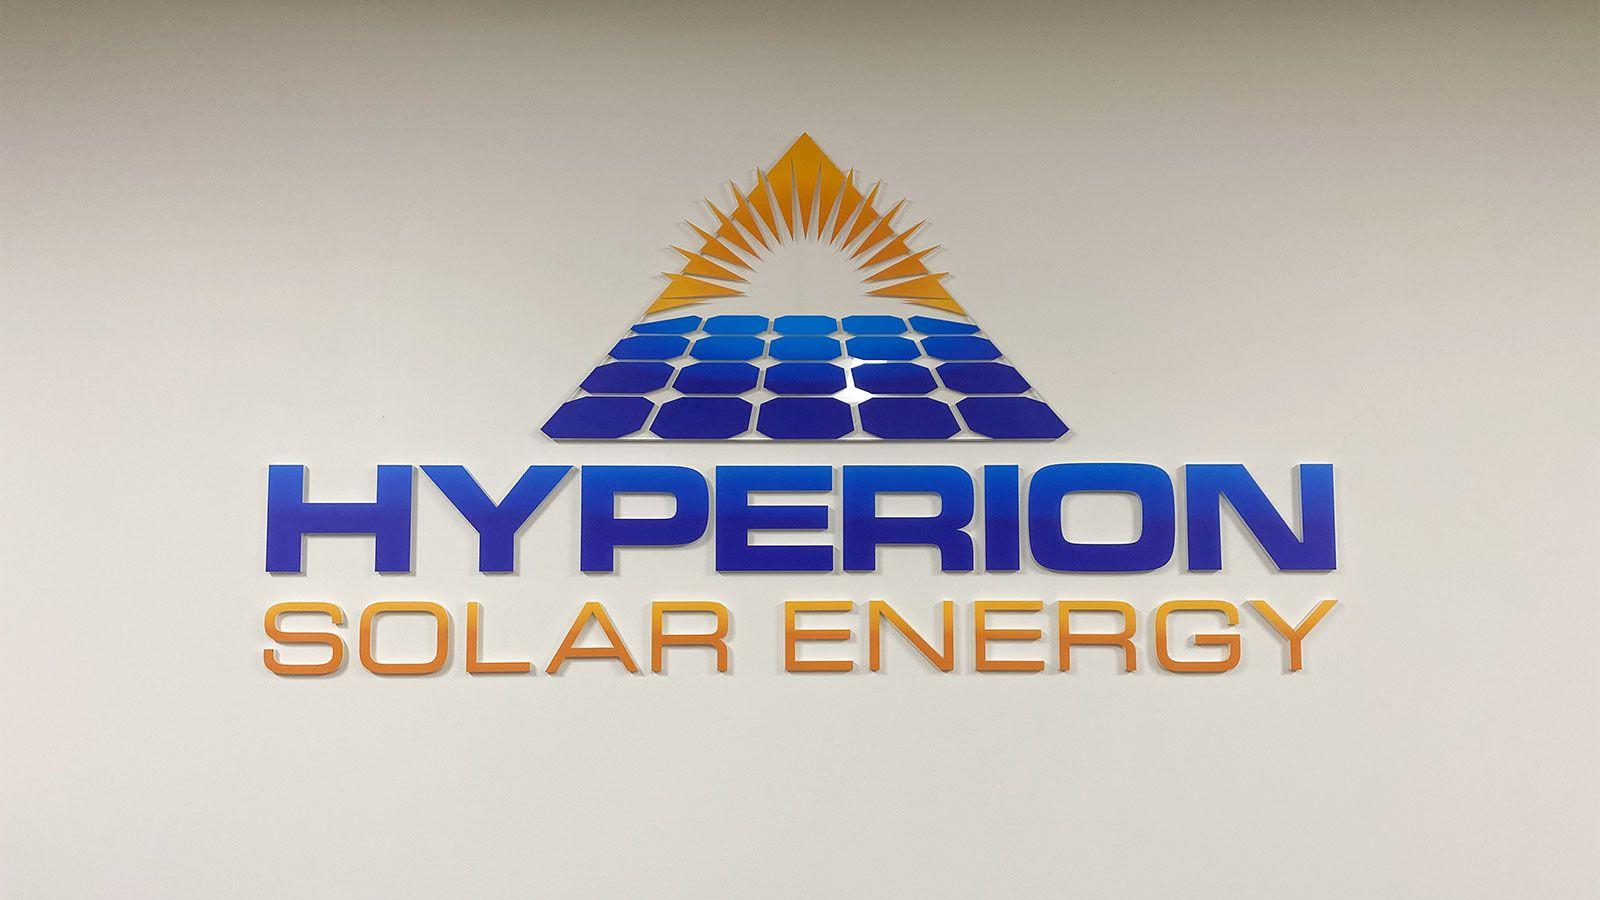 Hyperion 3D logo sign